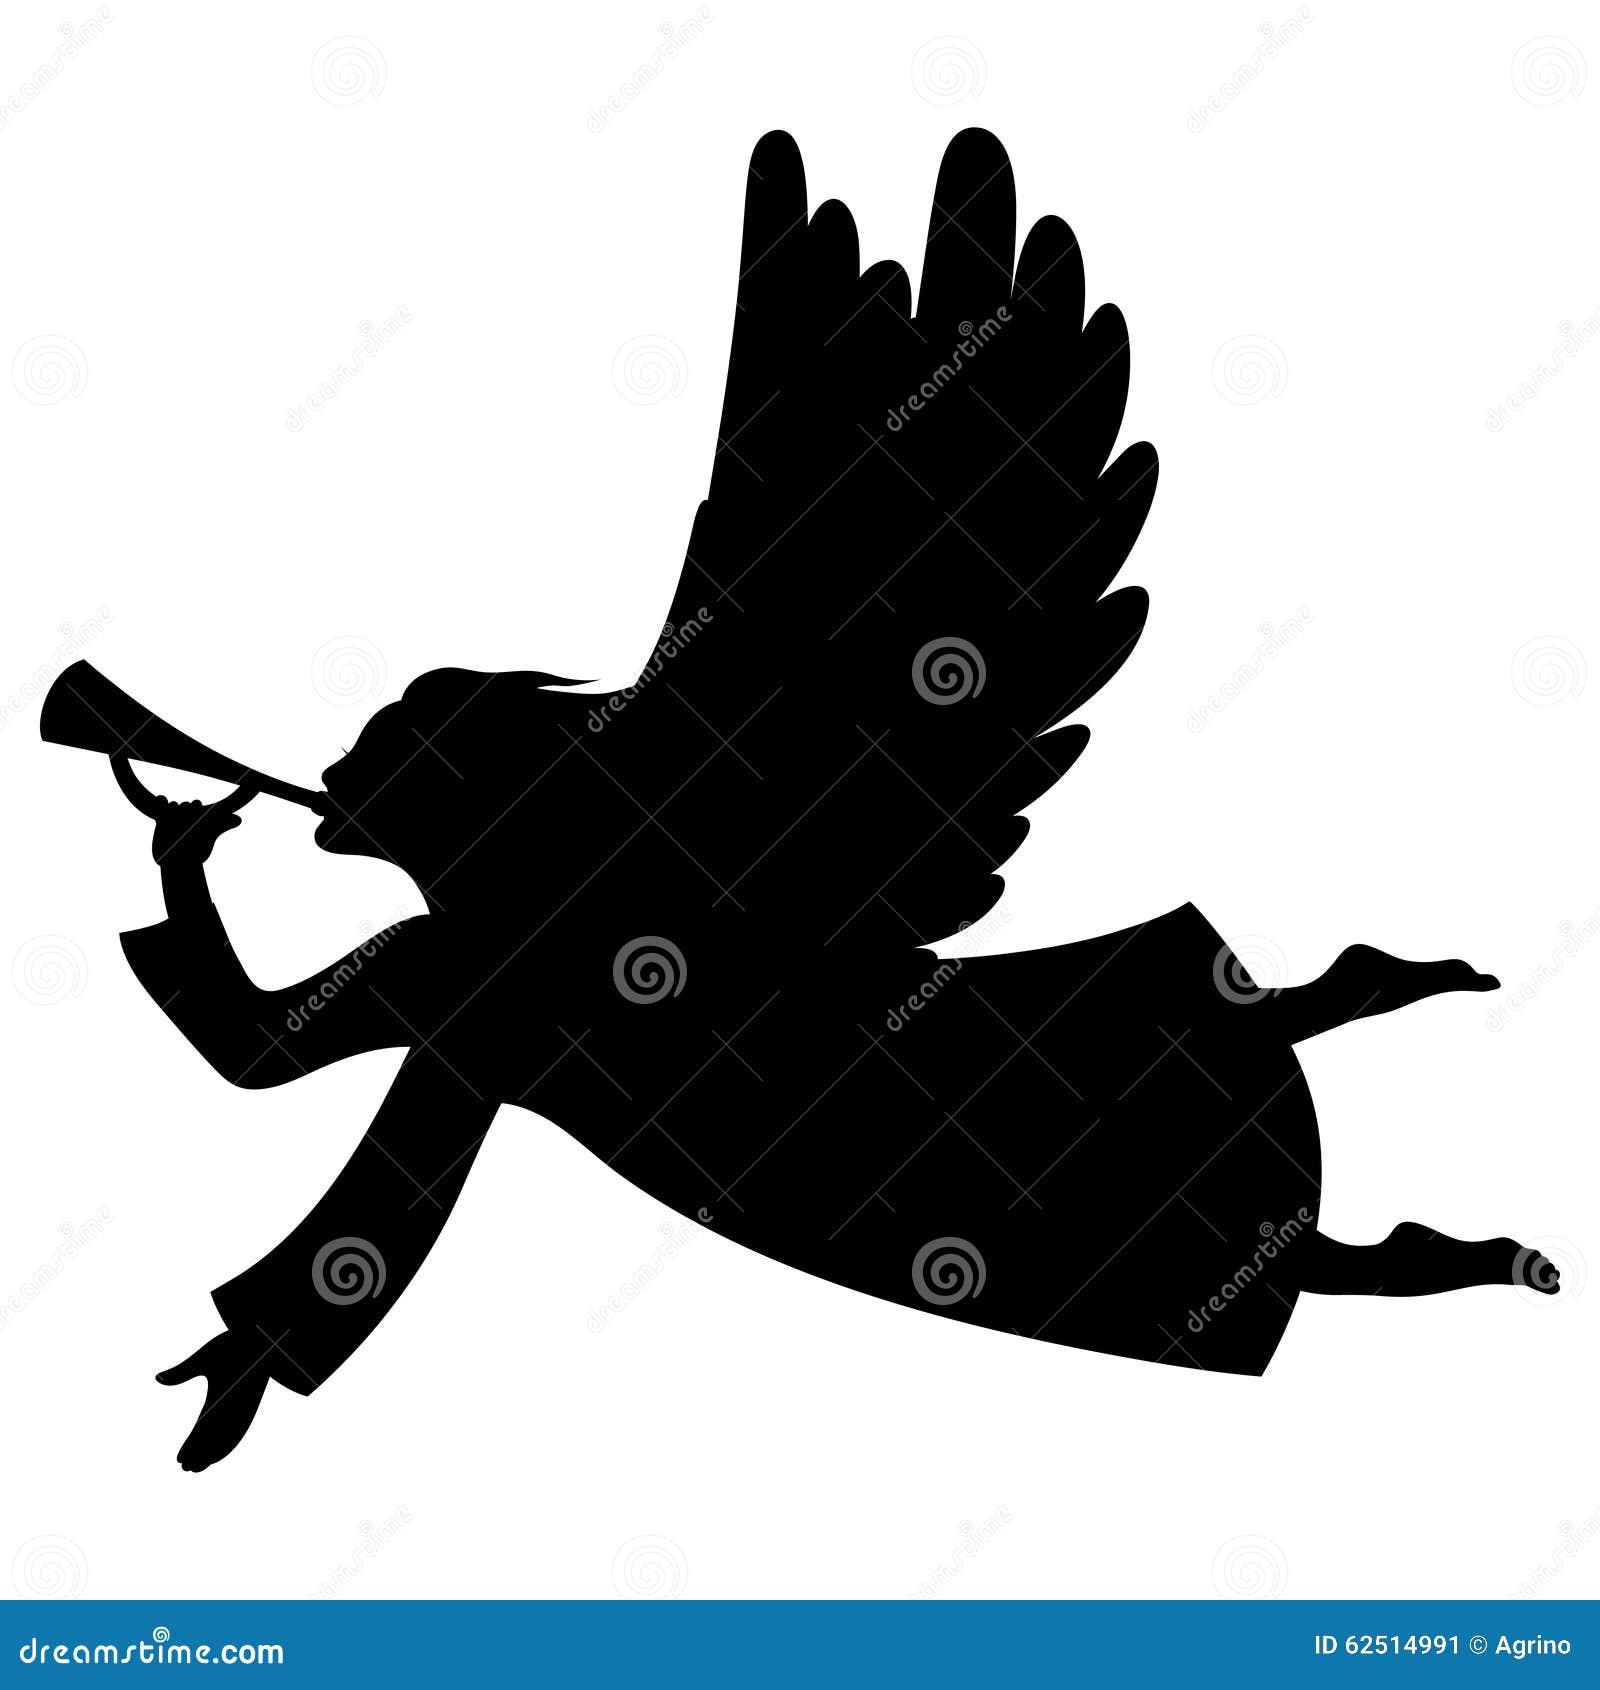 Christmas Angel Silhouette Stock Vector - Image: 62514991